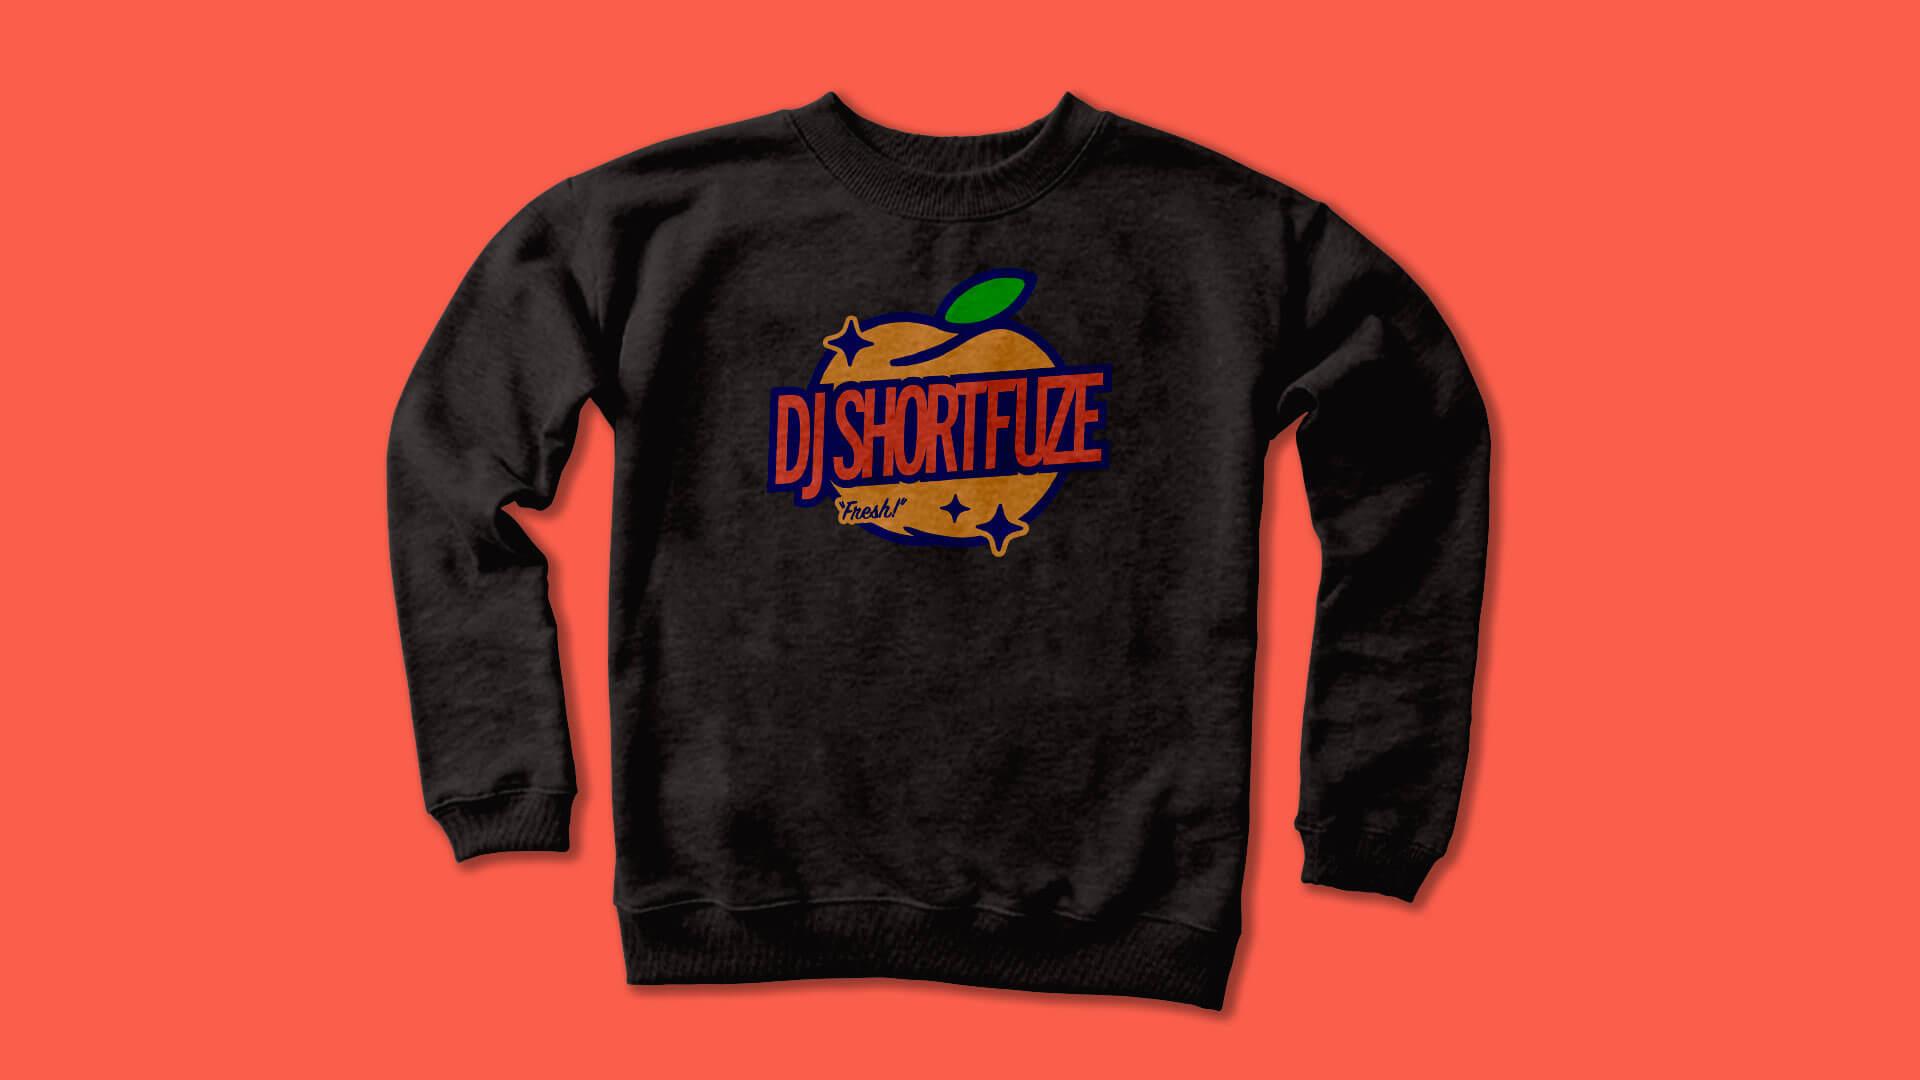 Shortfuze-SweaterSolo_1920px